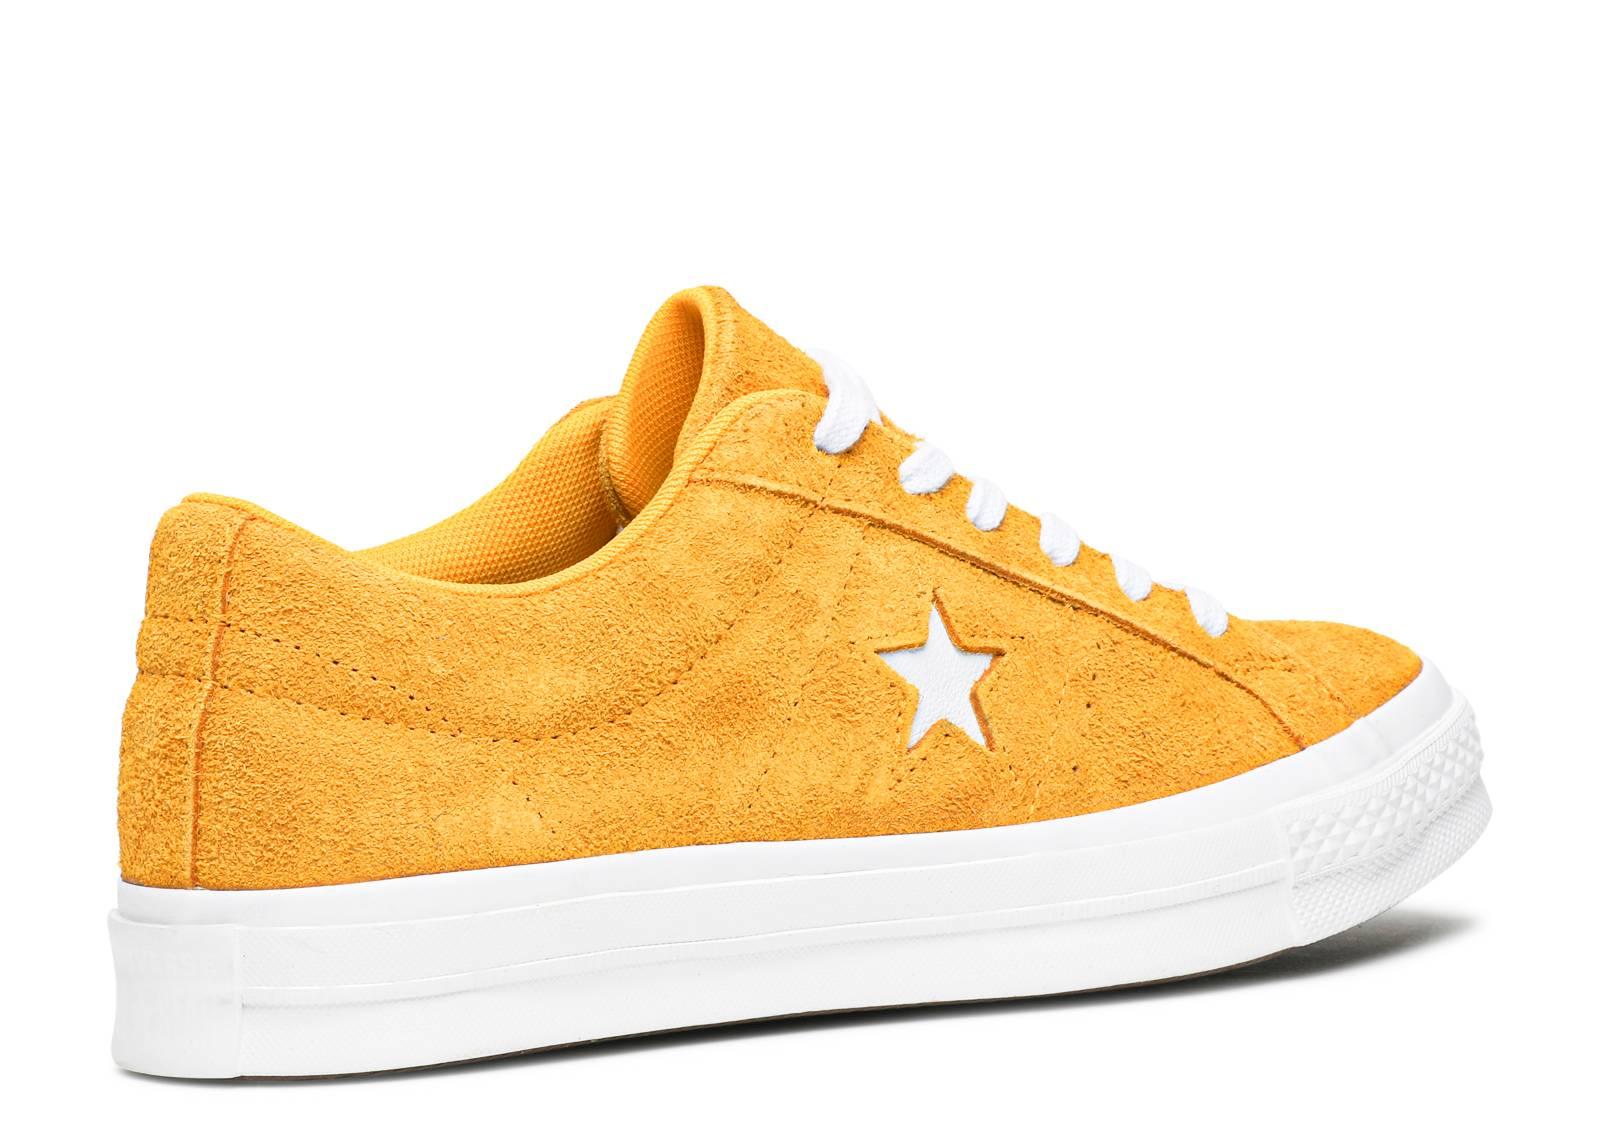 One Star Ox Golf Le Fleur Converse 159435c Sulphur Egret